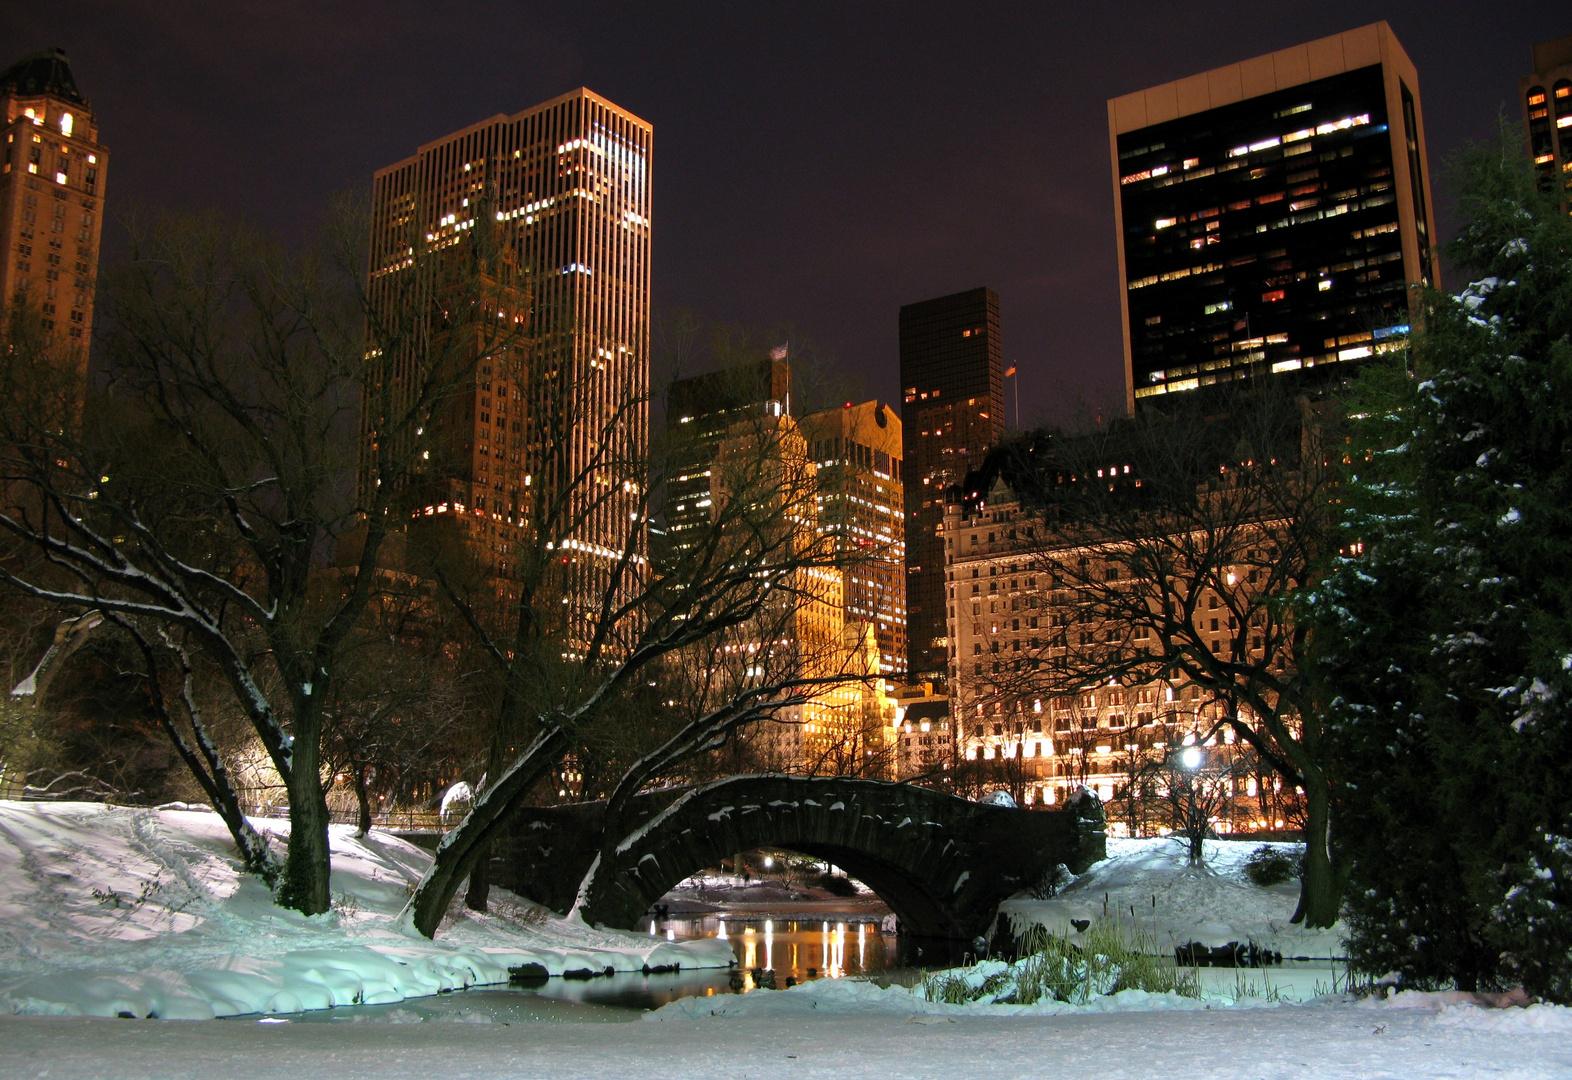 Winter im Central Park - 20. Dezember 2009